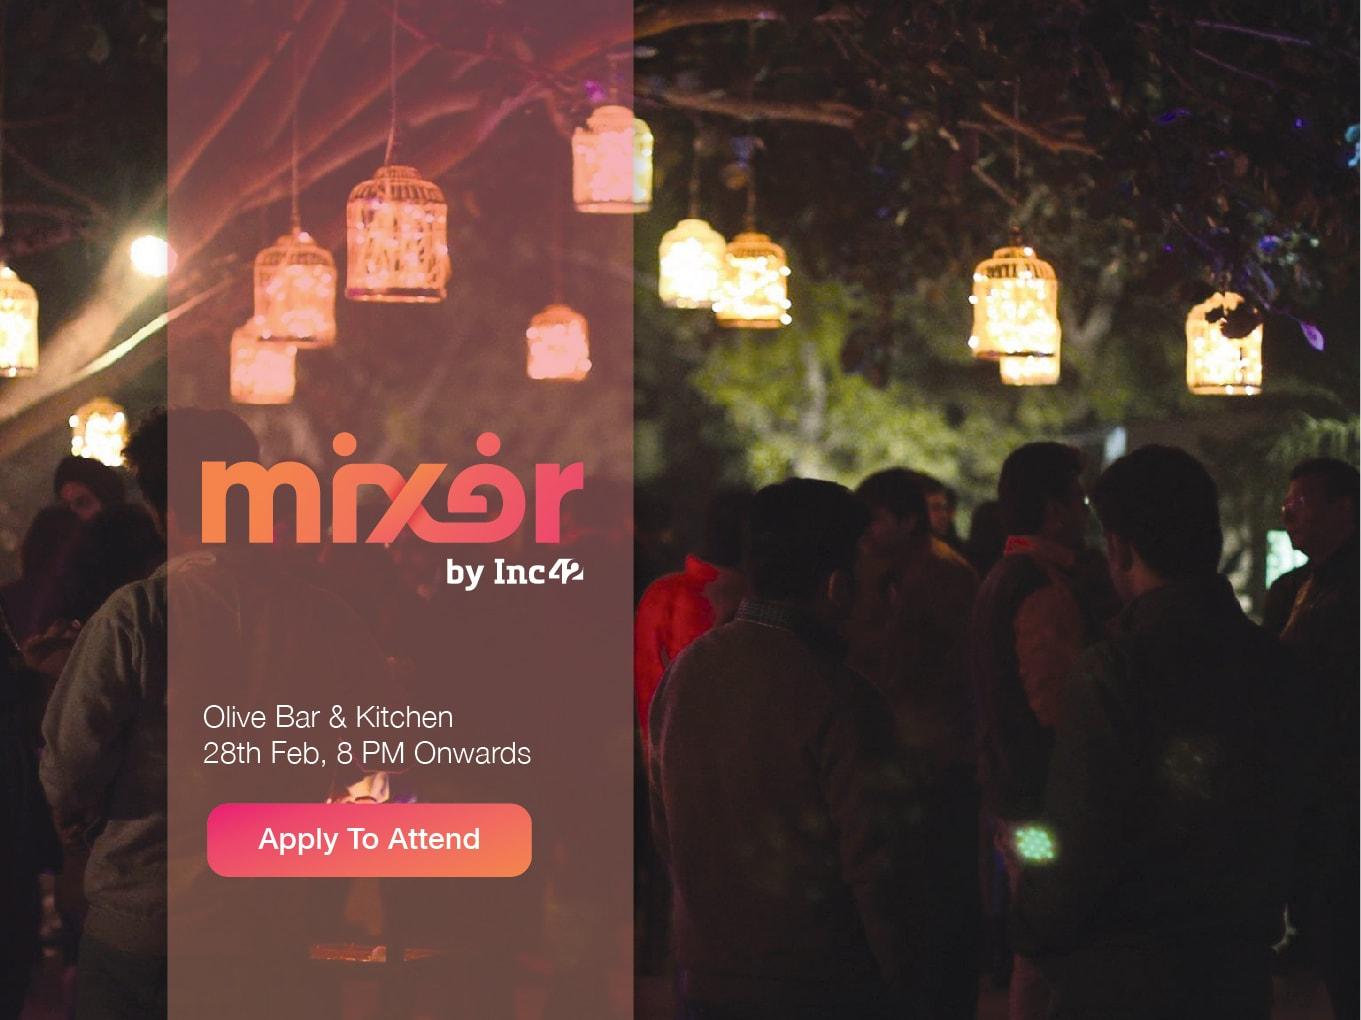 Inc42 Mixer: A Relaxing Evening Of Bonding For Delhi's Entrepreneurs